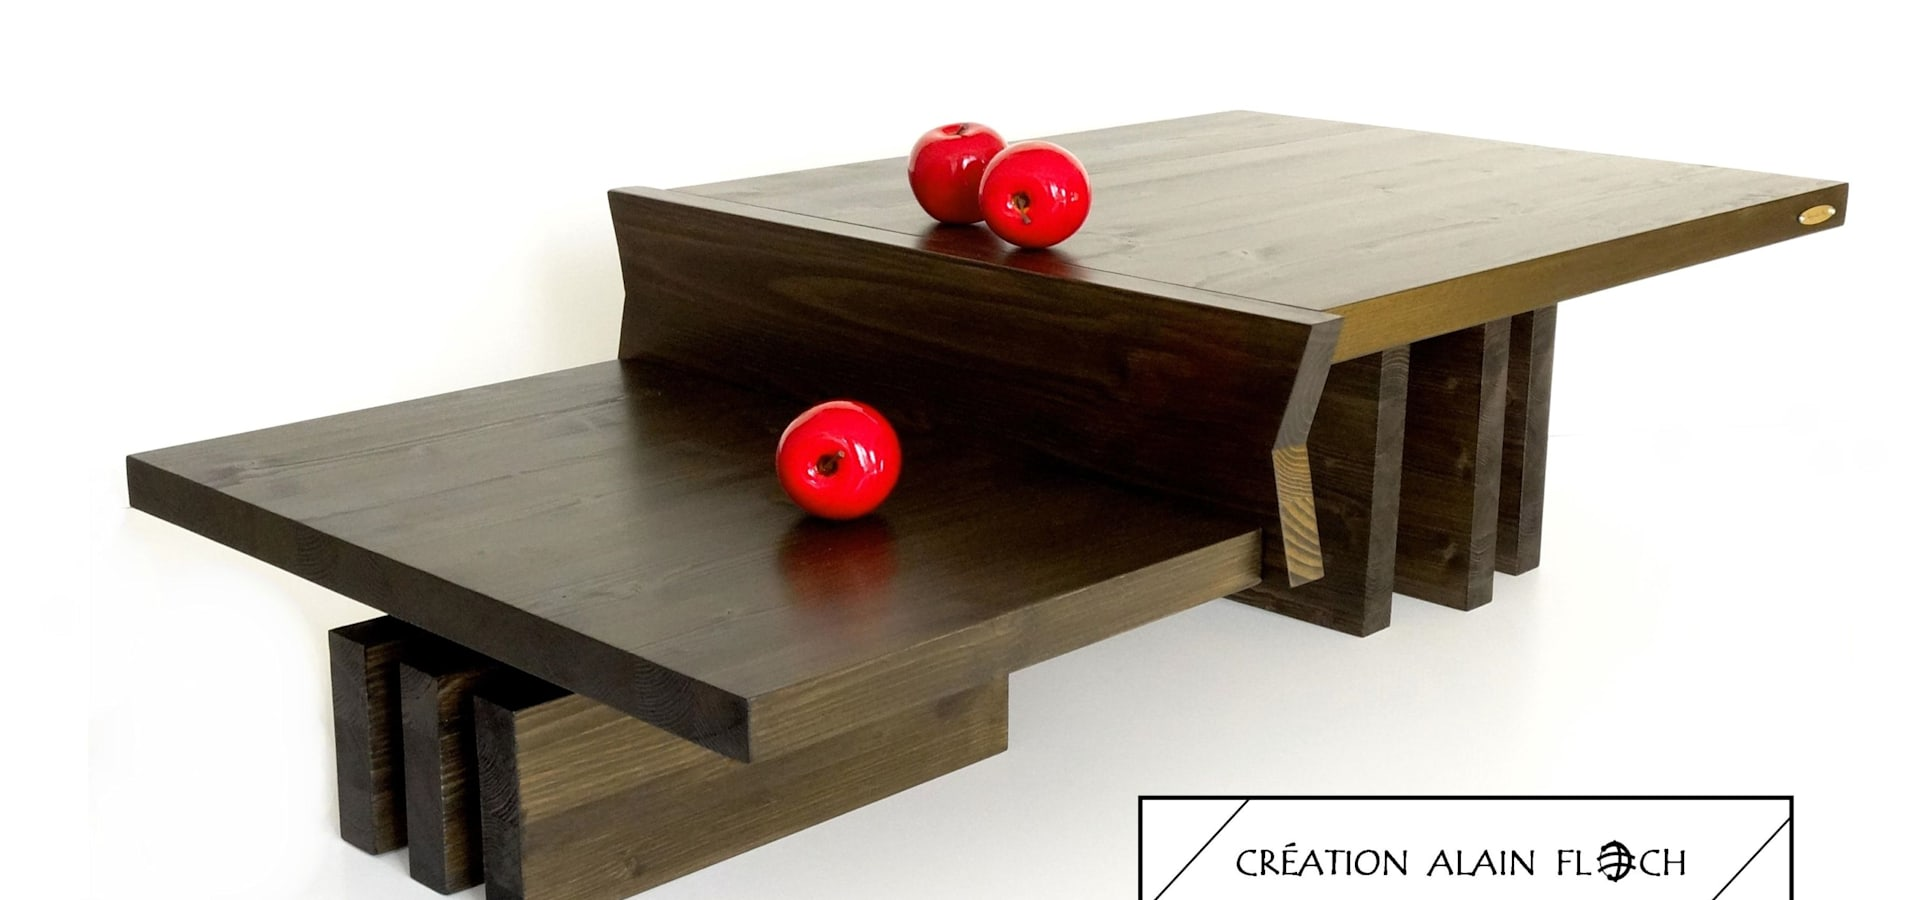 vpa design artistes artisans vic la gardiole sur homify. Black Bedroom Furniture Sets. Home Design Ideas